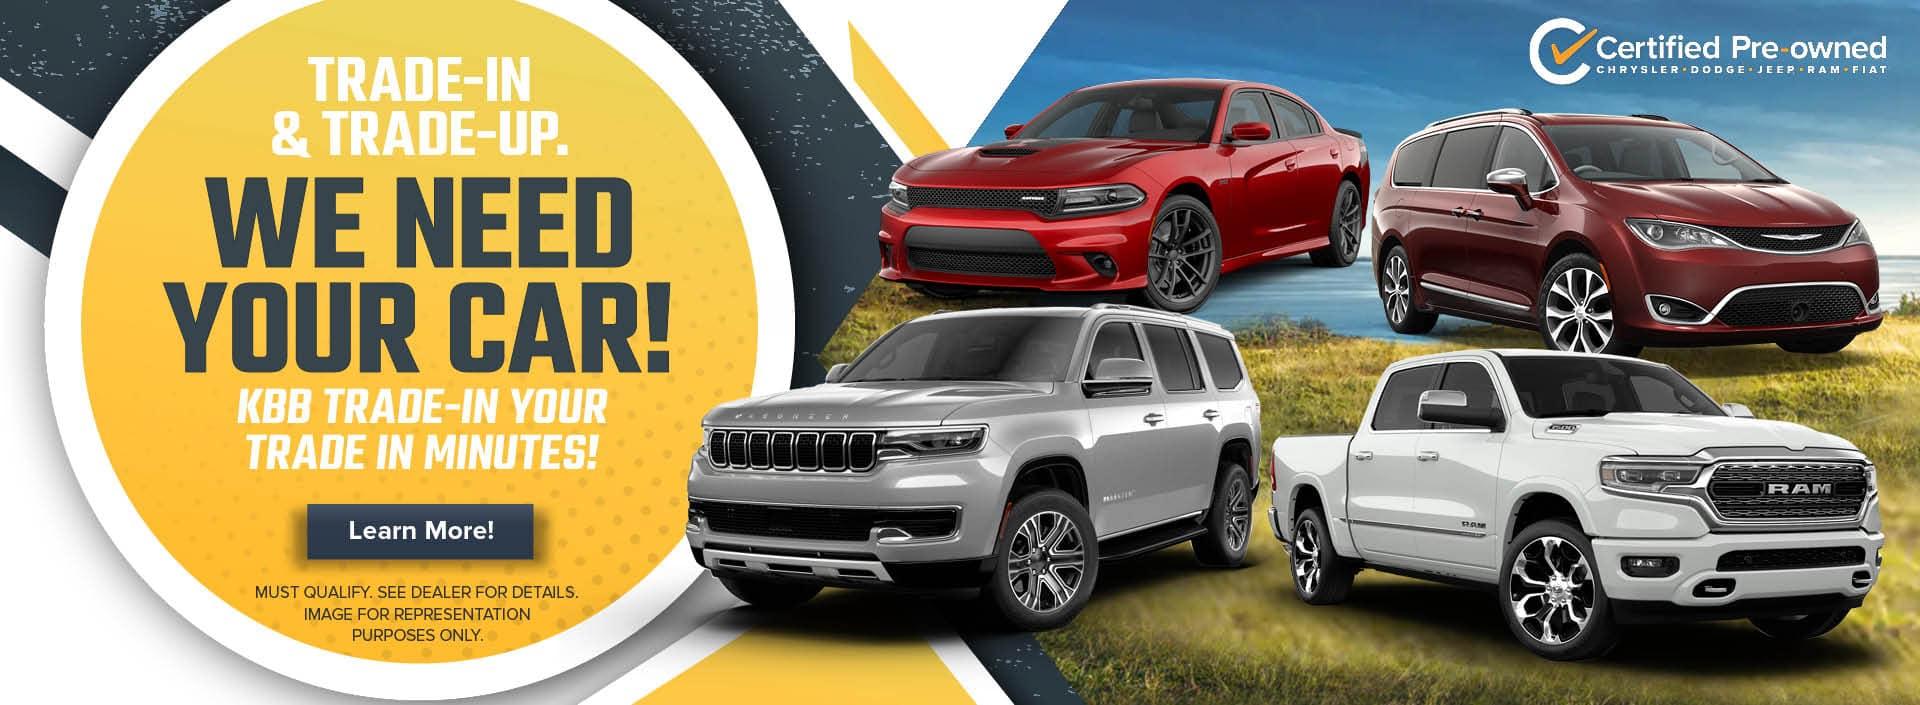 Chrysler Dodge Jeep Ram Certified Program